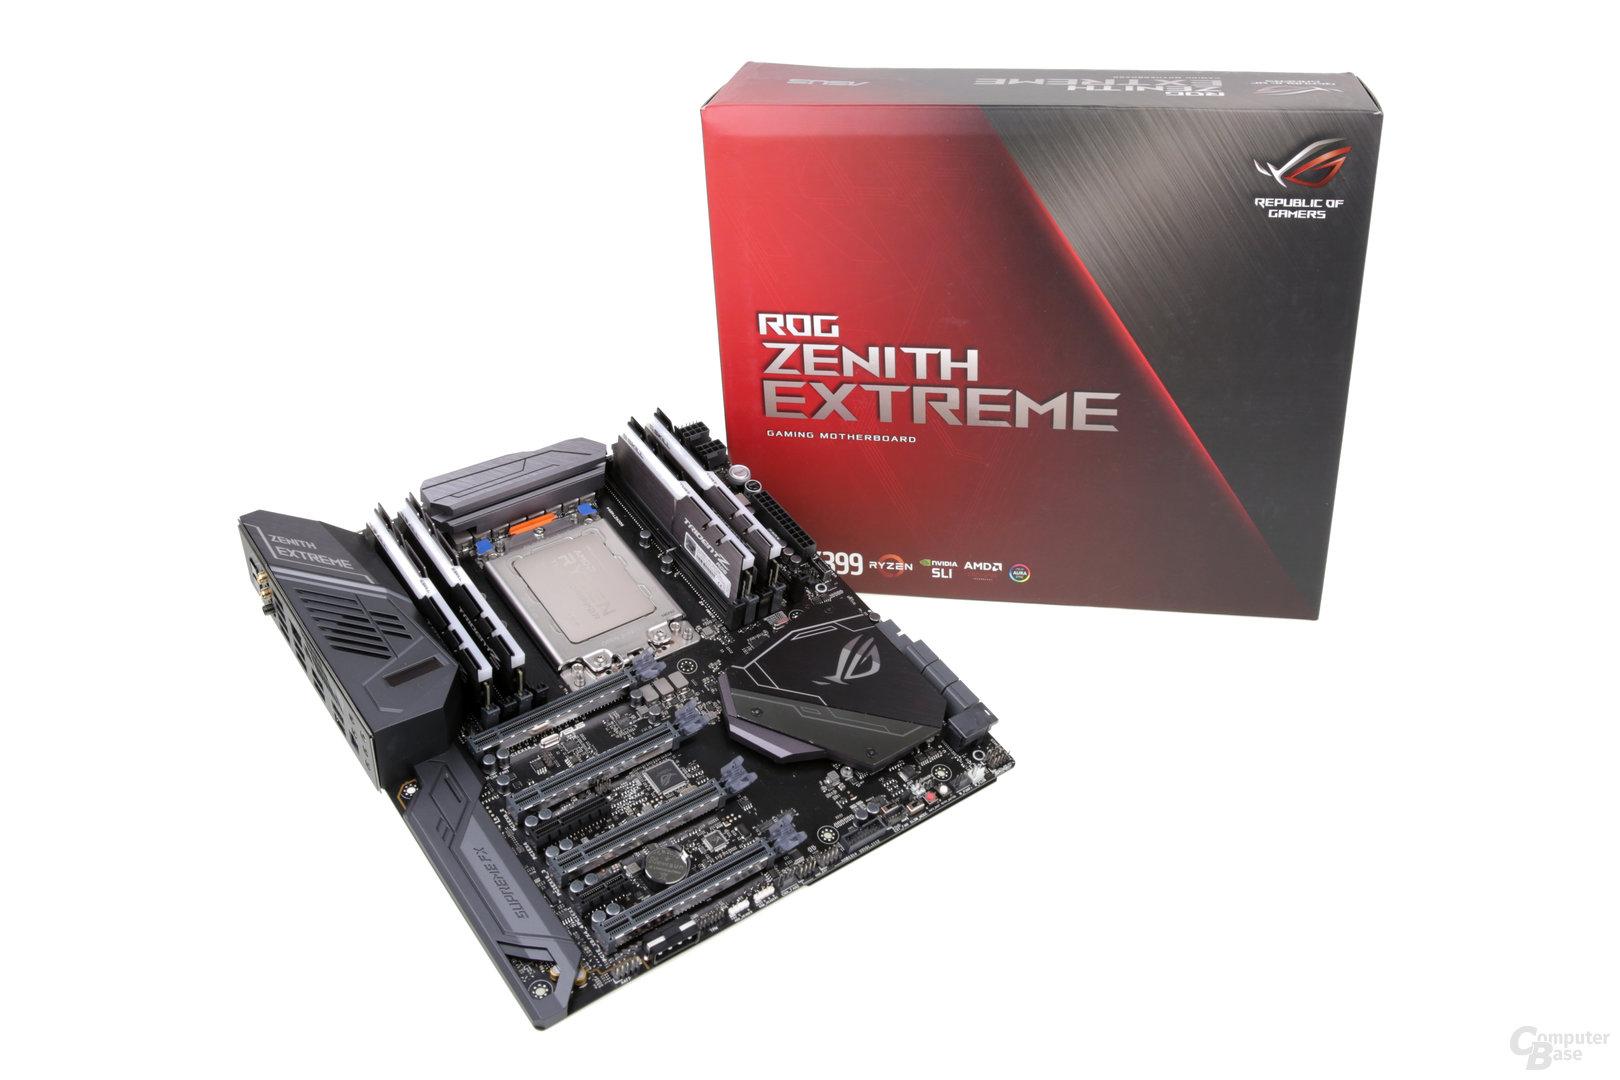 Das Asus ROG Zenith Extreme X399